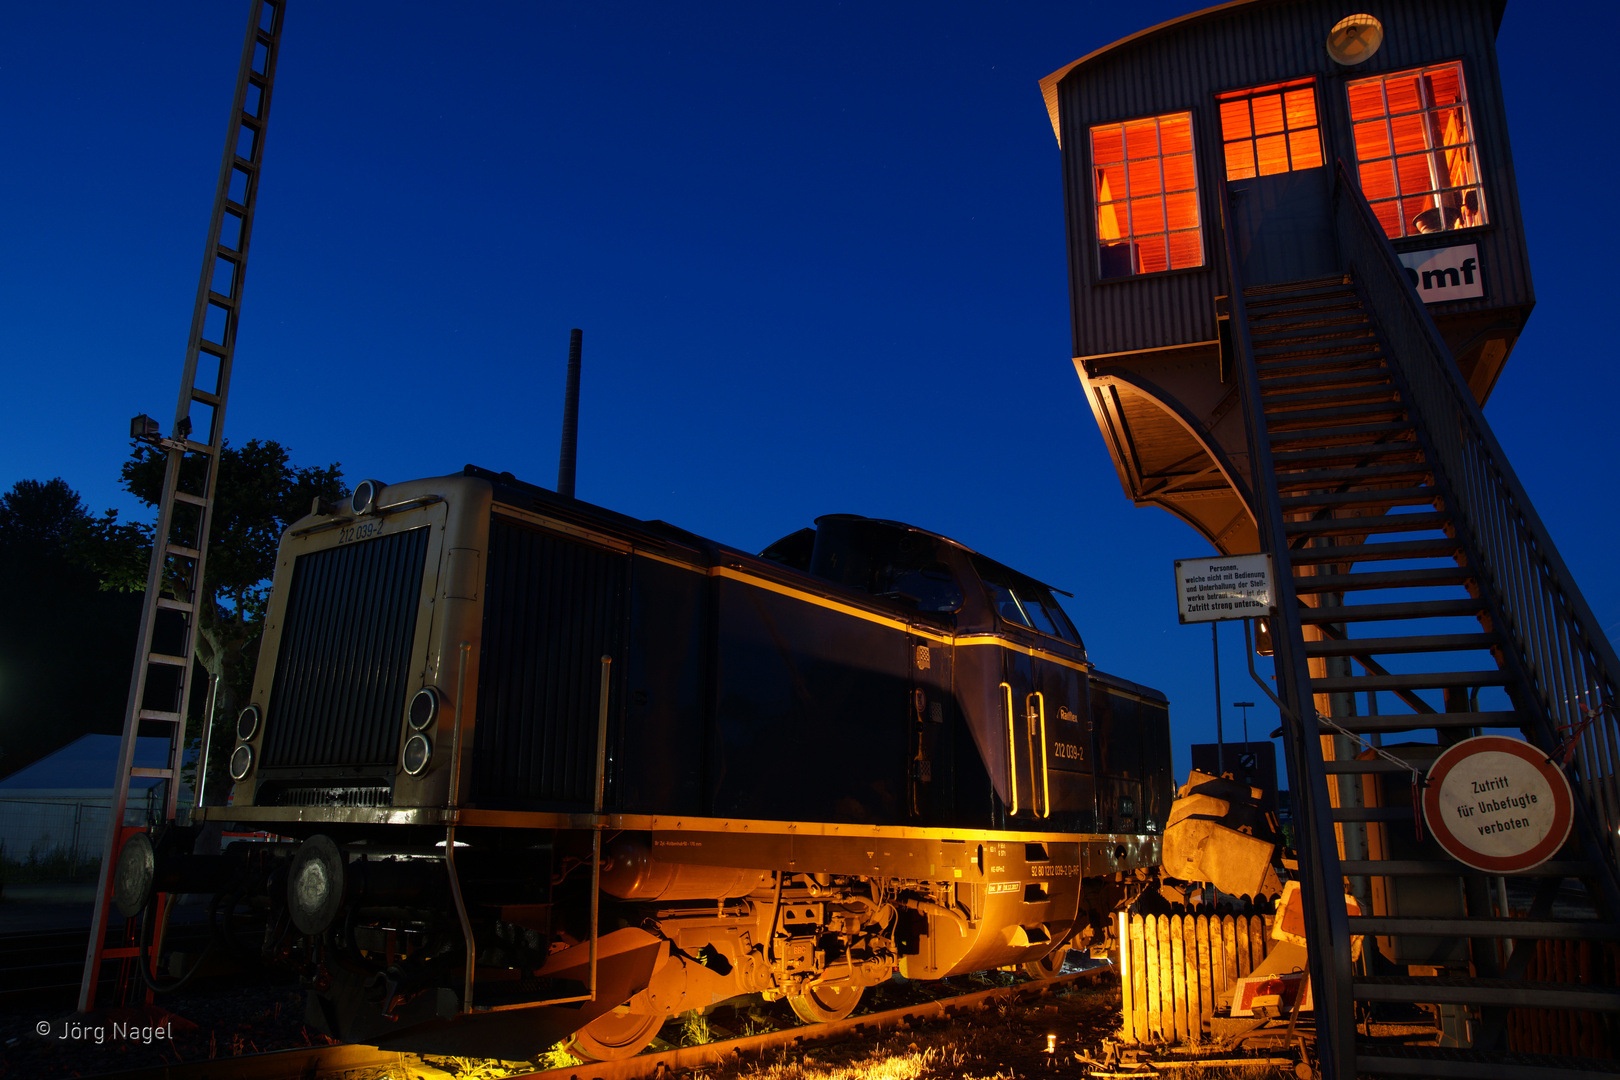 Nachts im Eisenbahnmuseum 2